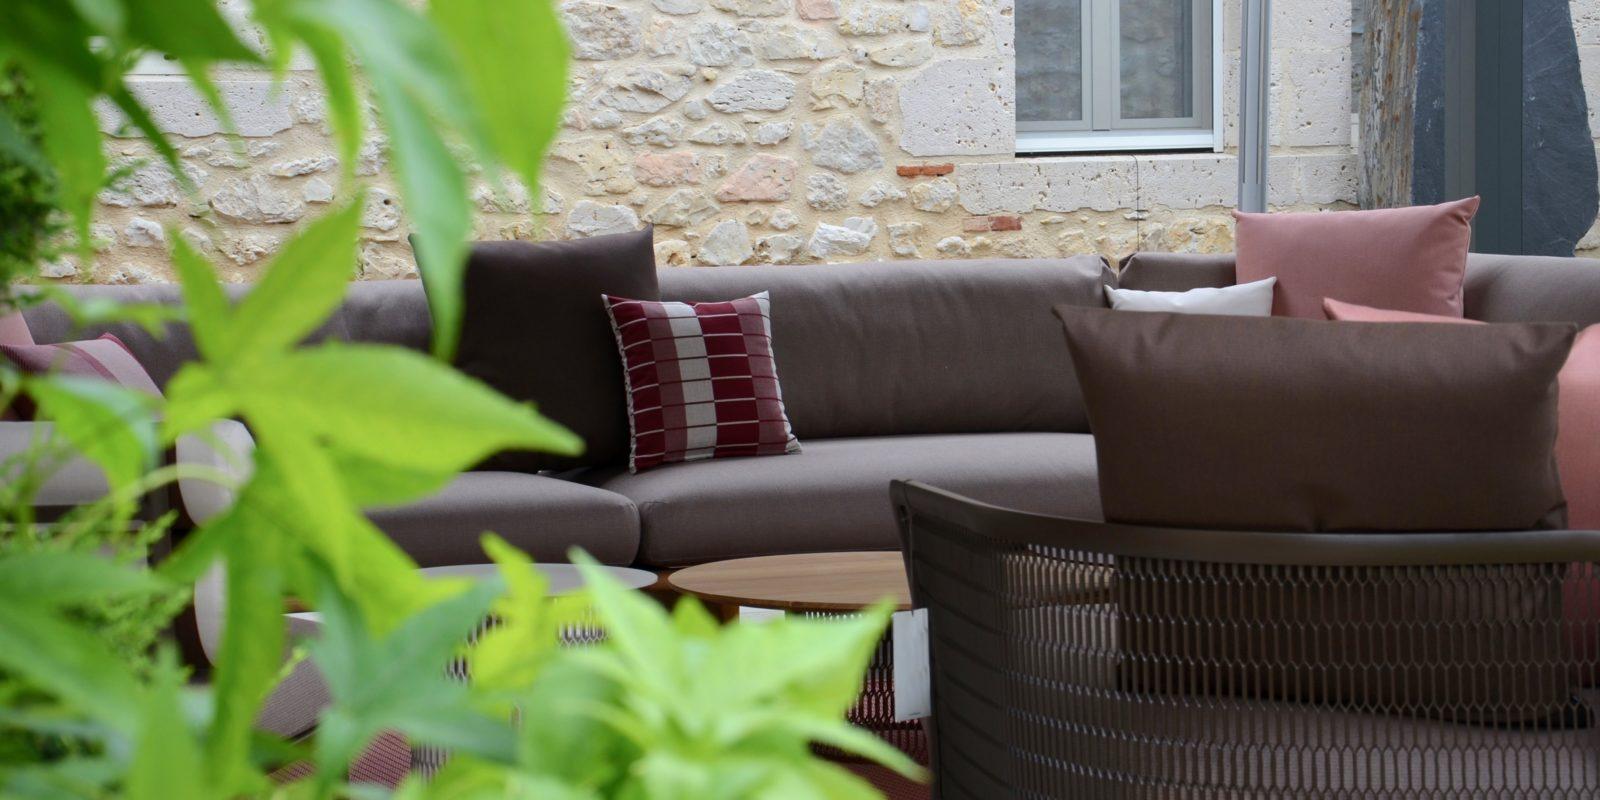 BUXUS Salon de jardin haut de gamme